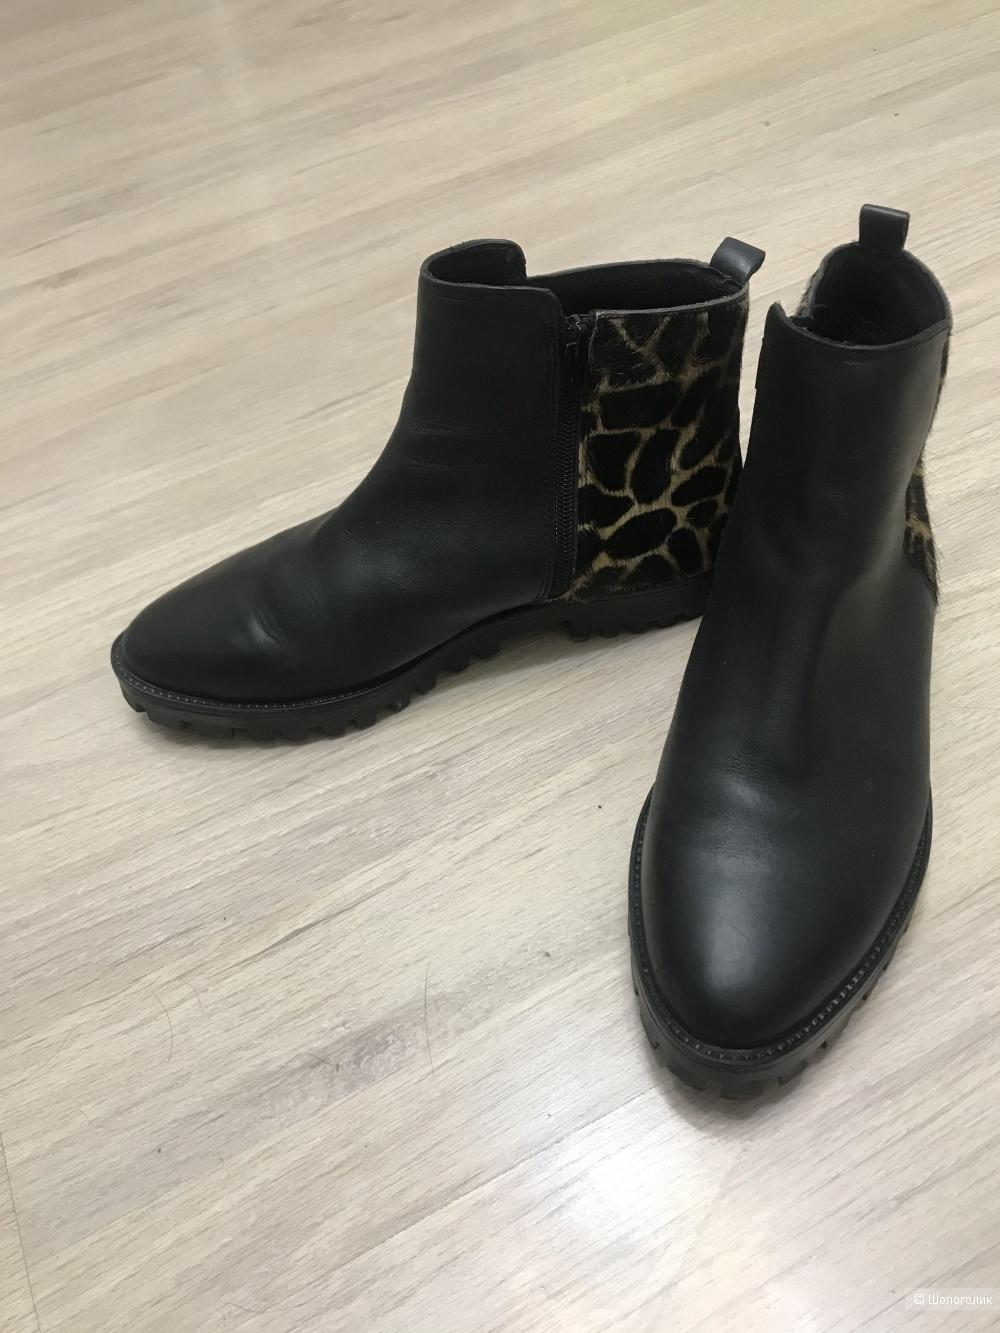 Ботинки S.Oliver, 39 размер